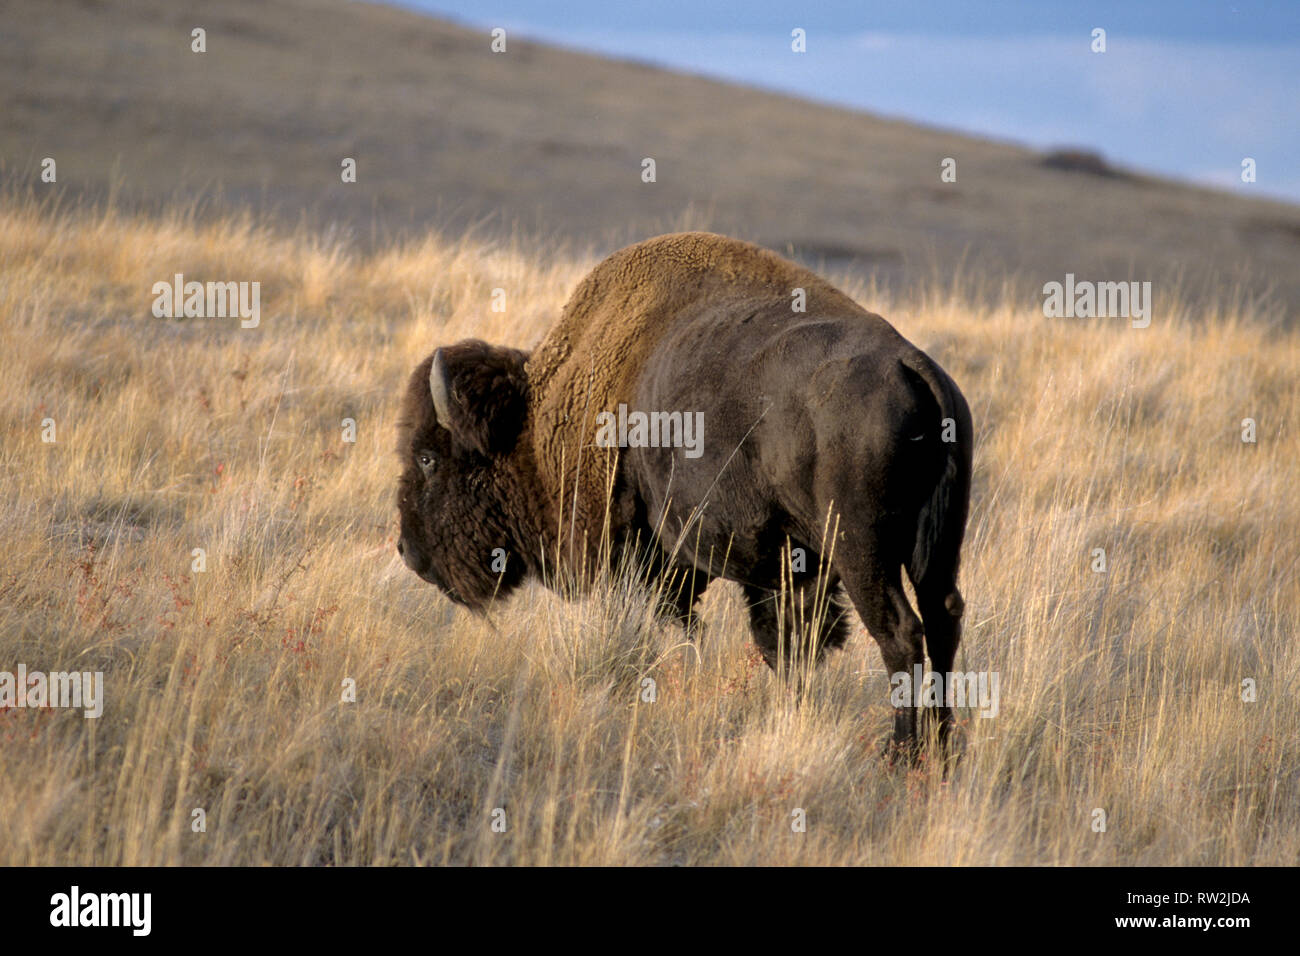 American bison; National Bison Range, NW Montana - Stock Image